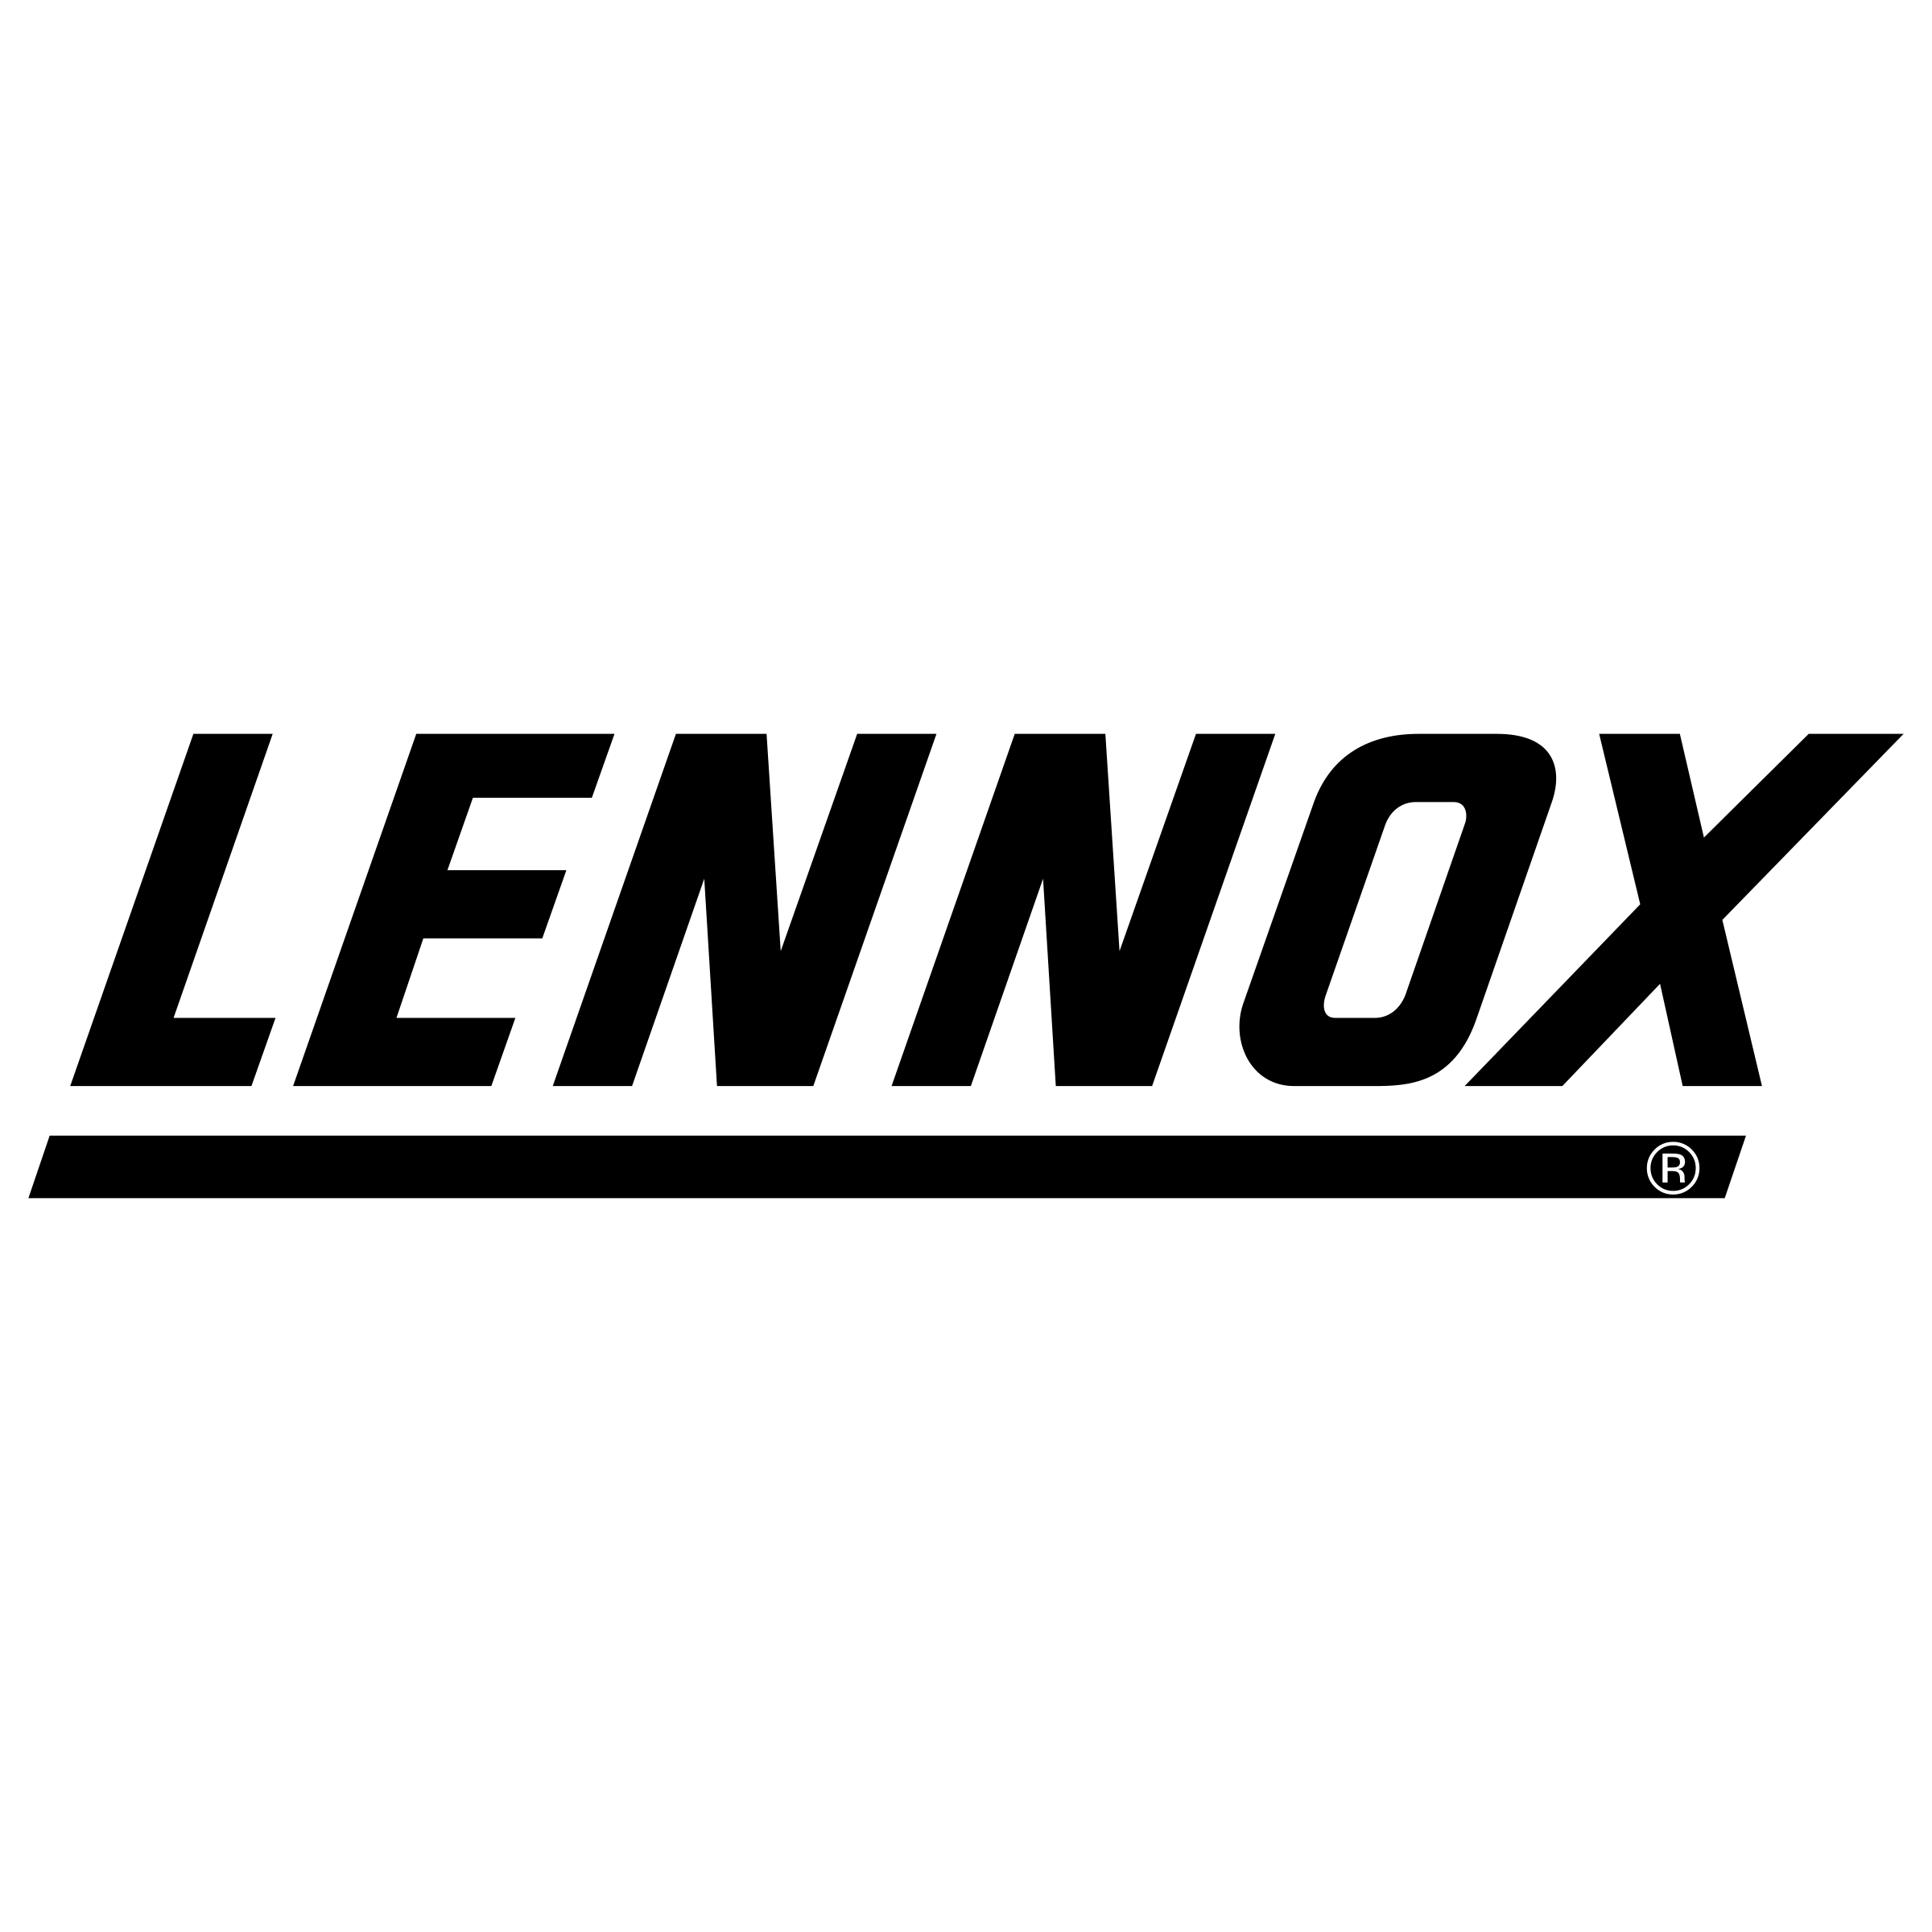 Lennox Logo PNG Transparent & SVG Vector.